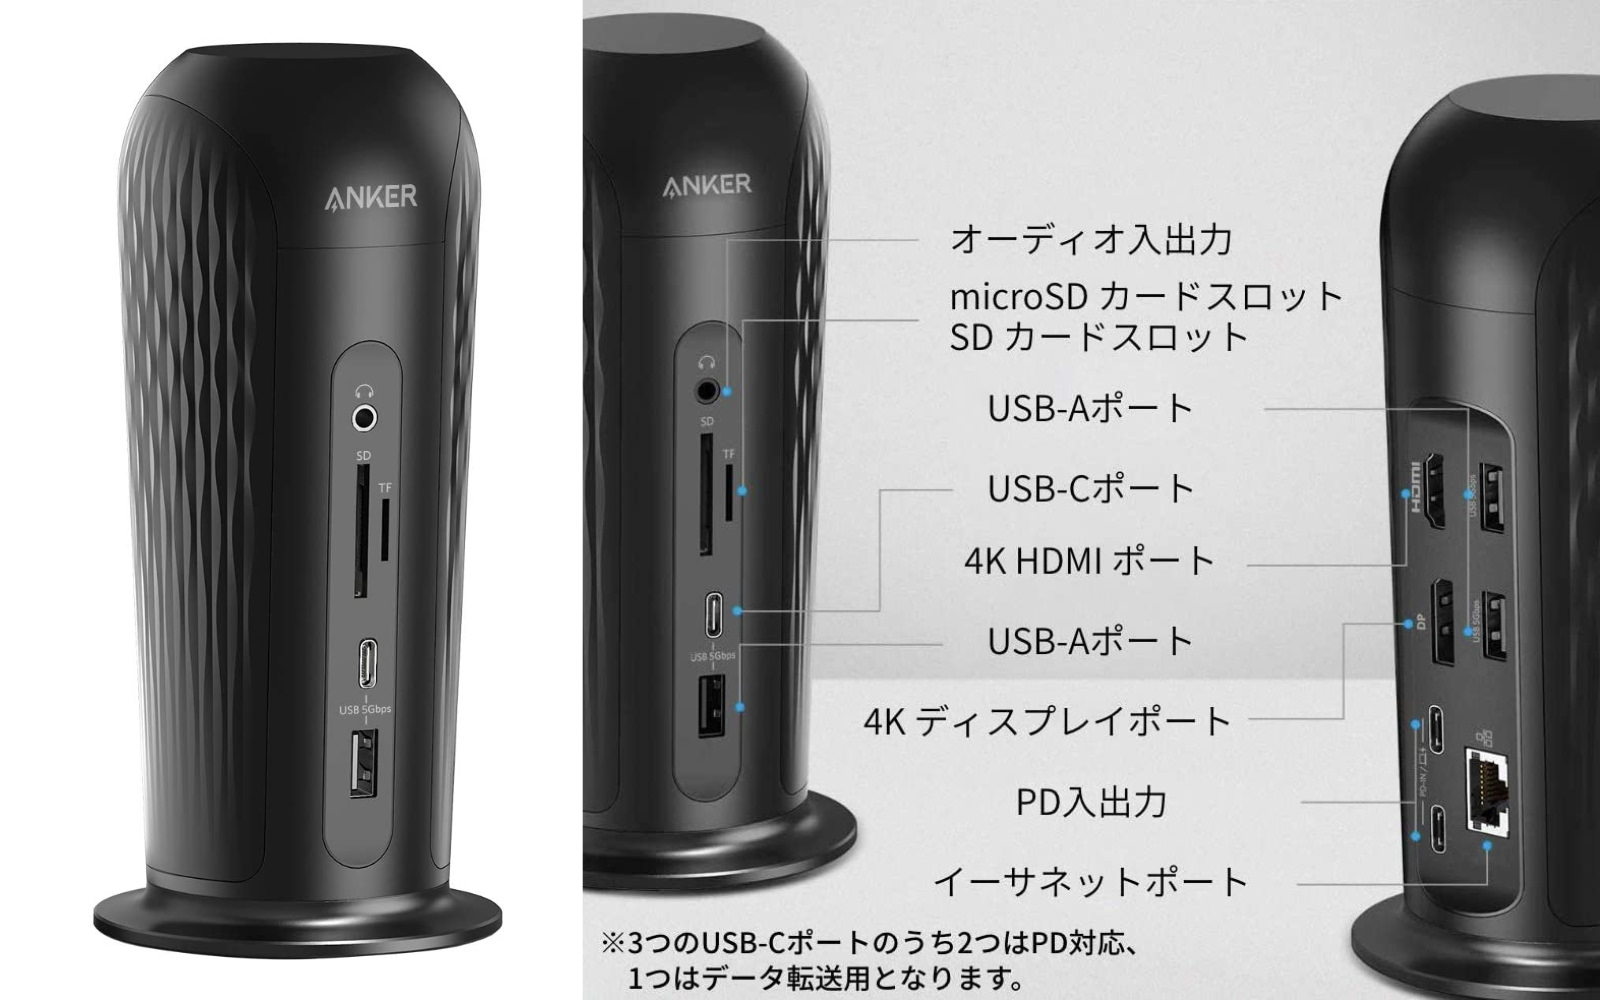 Anker PowerExpand 12 in 1 USB C PD Media Dock